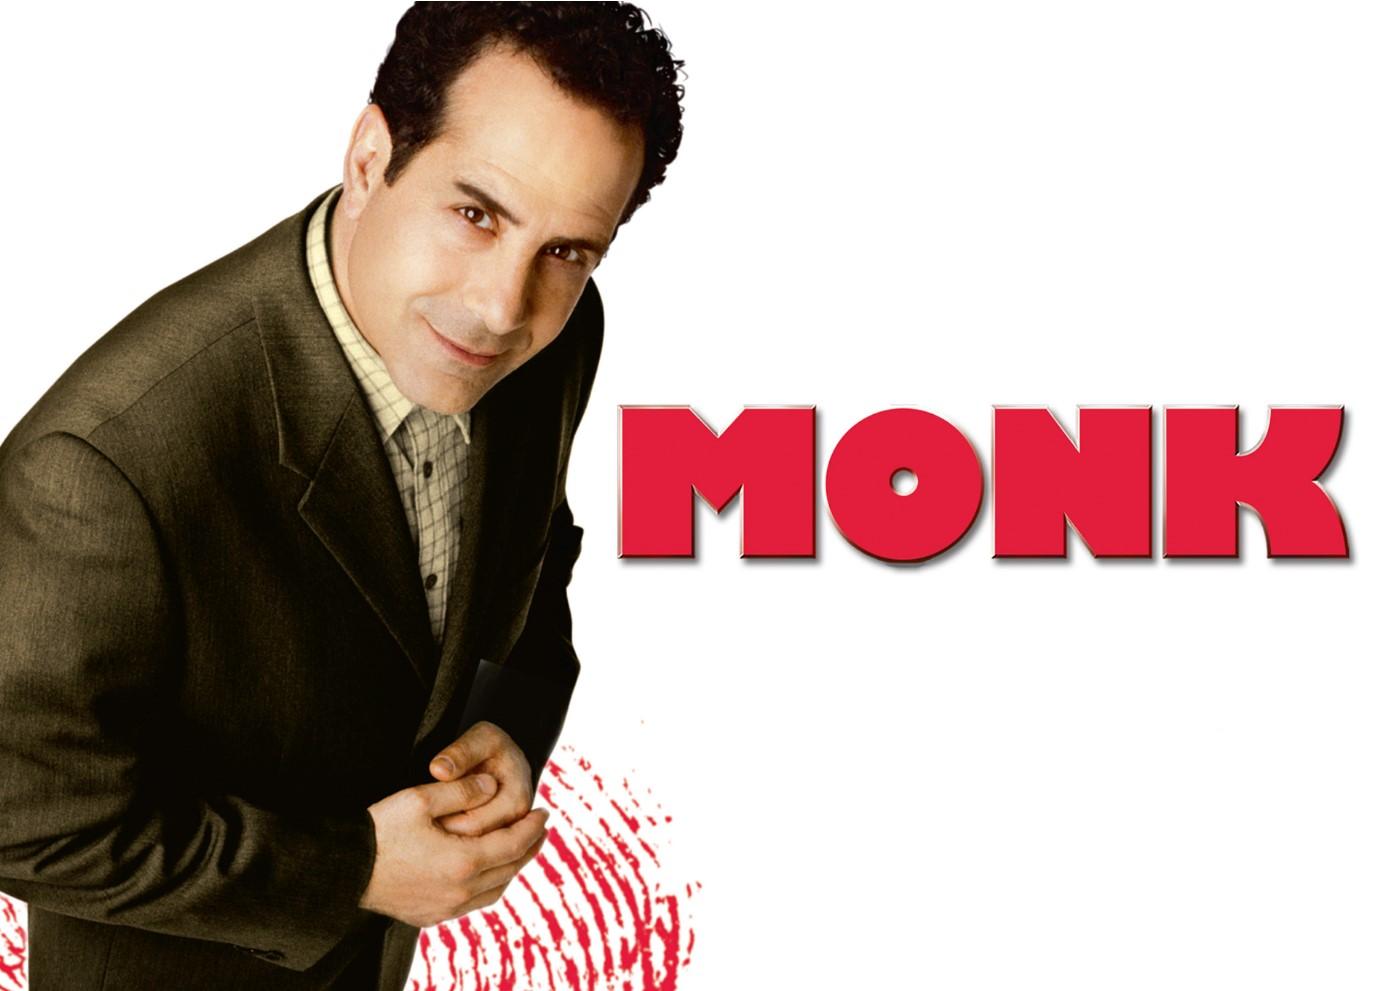 Monk2.jpg